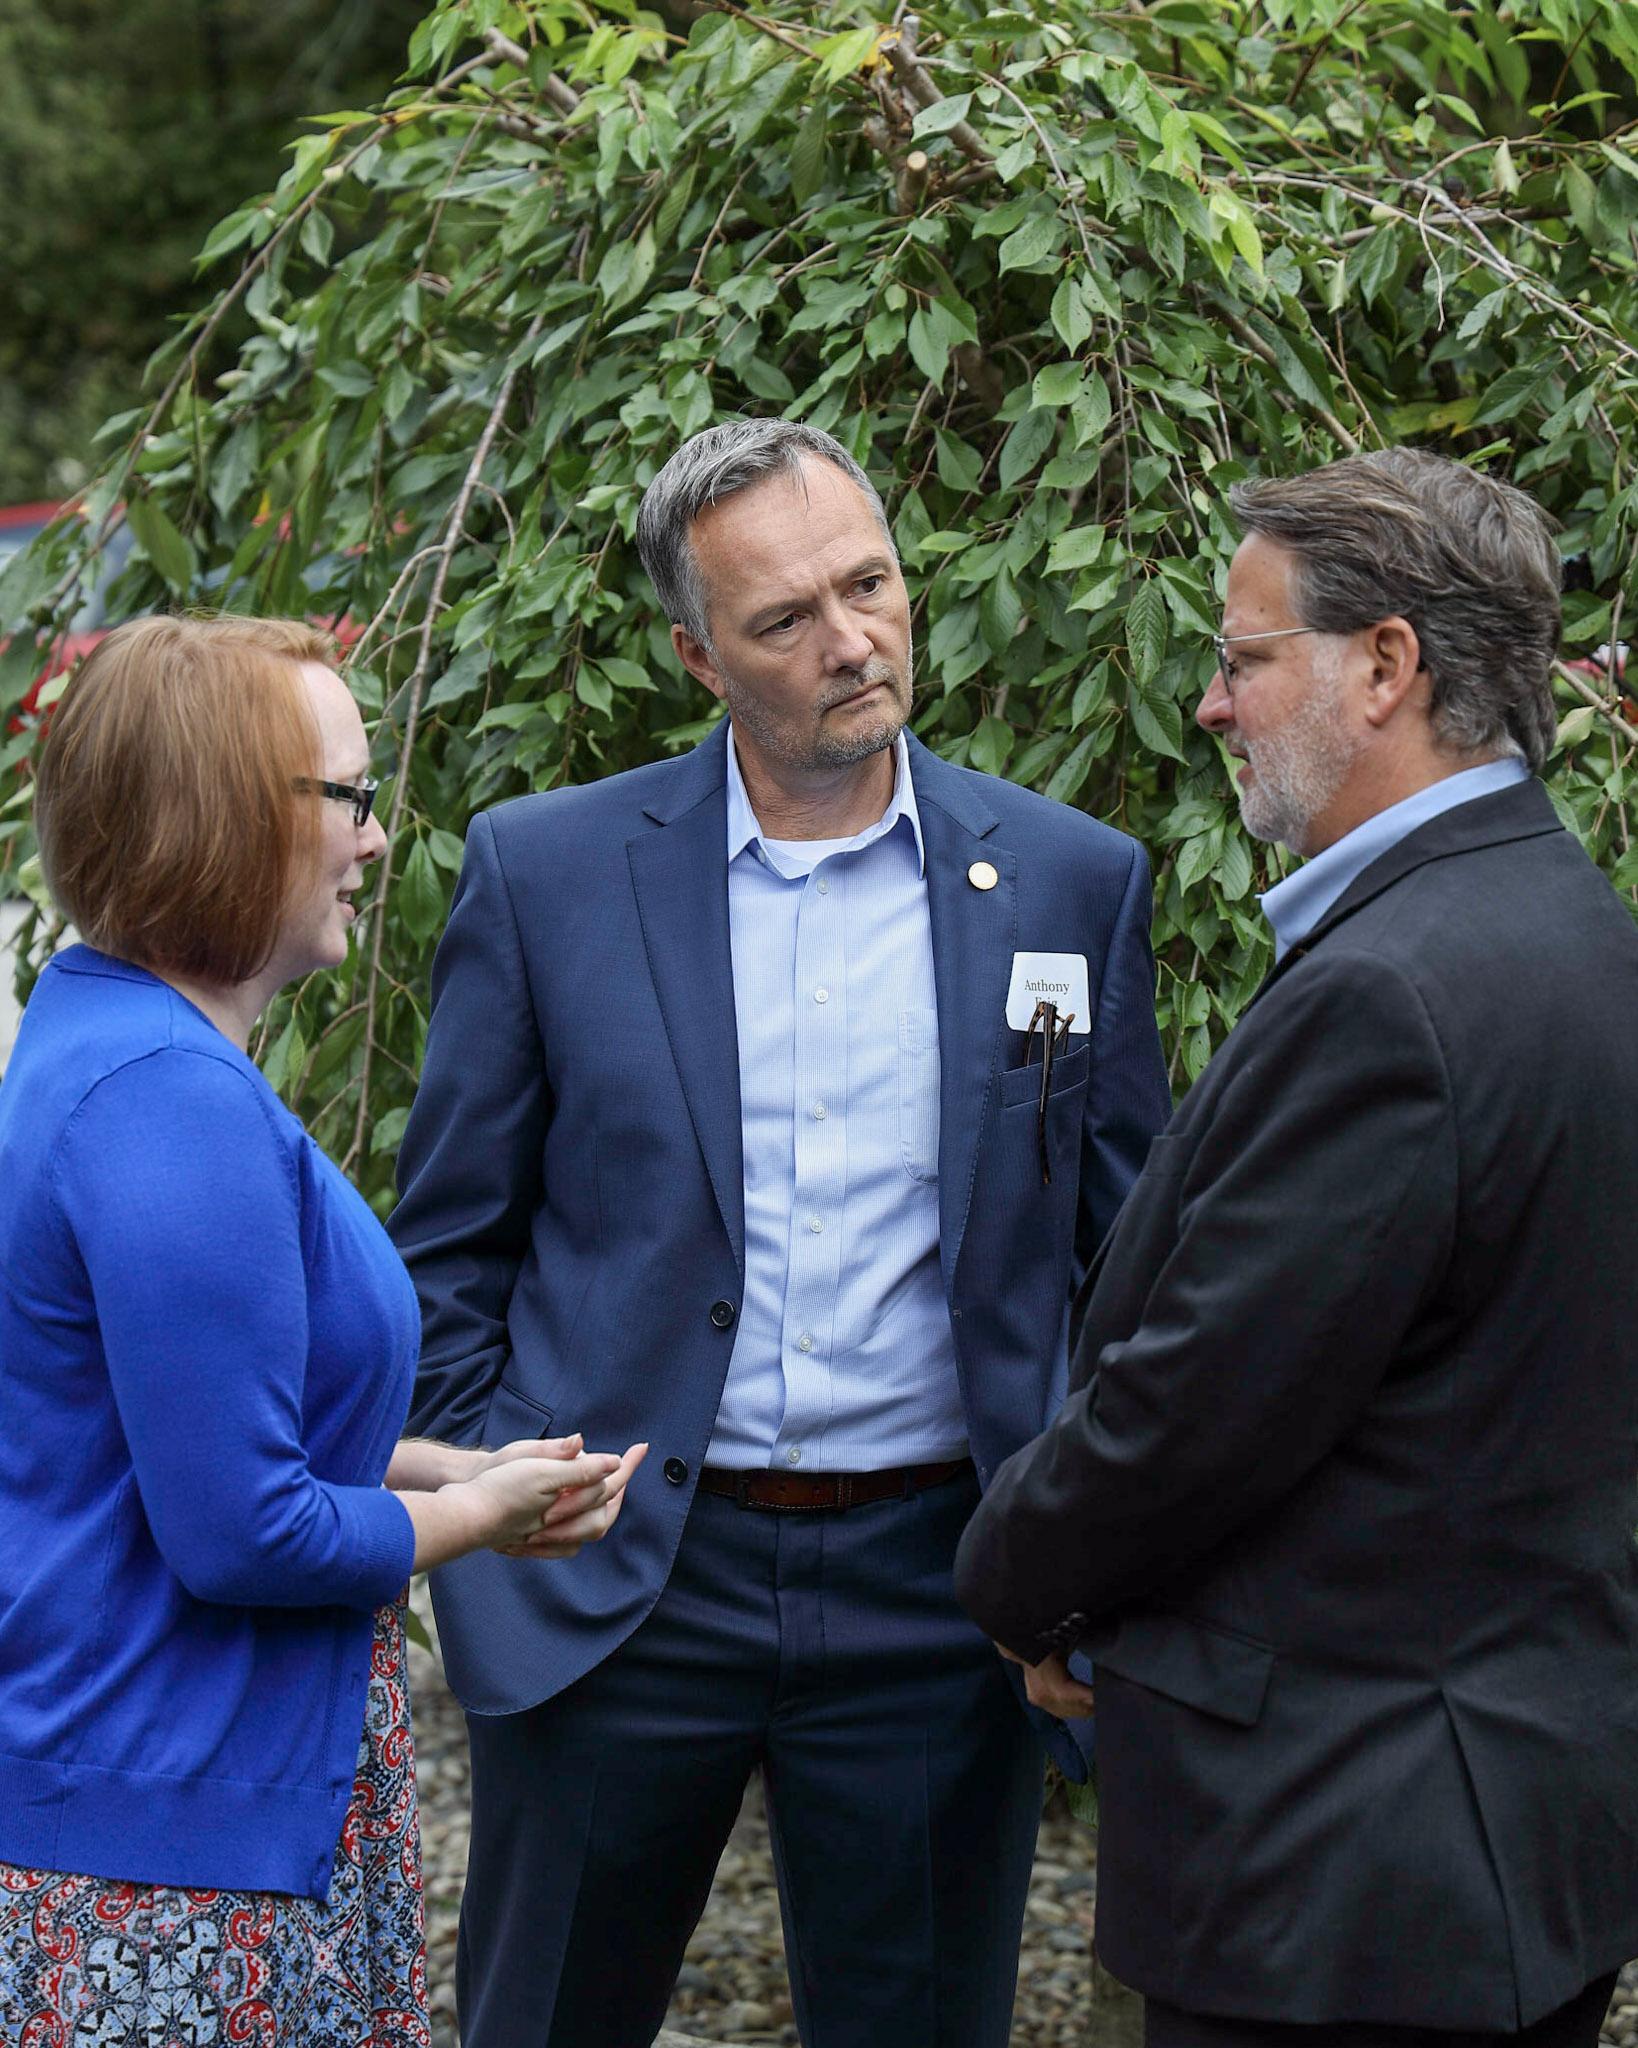 Lara Raisanen, Anthony, Sen. Peters